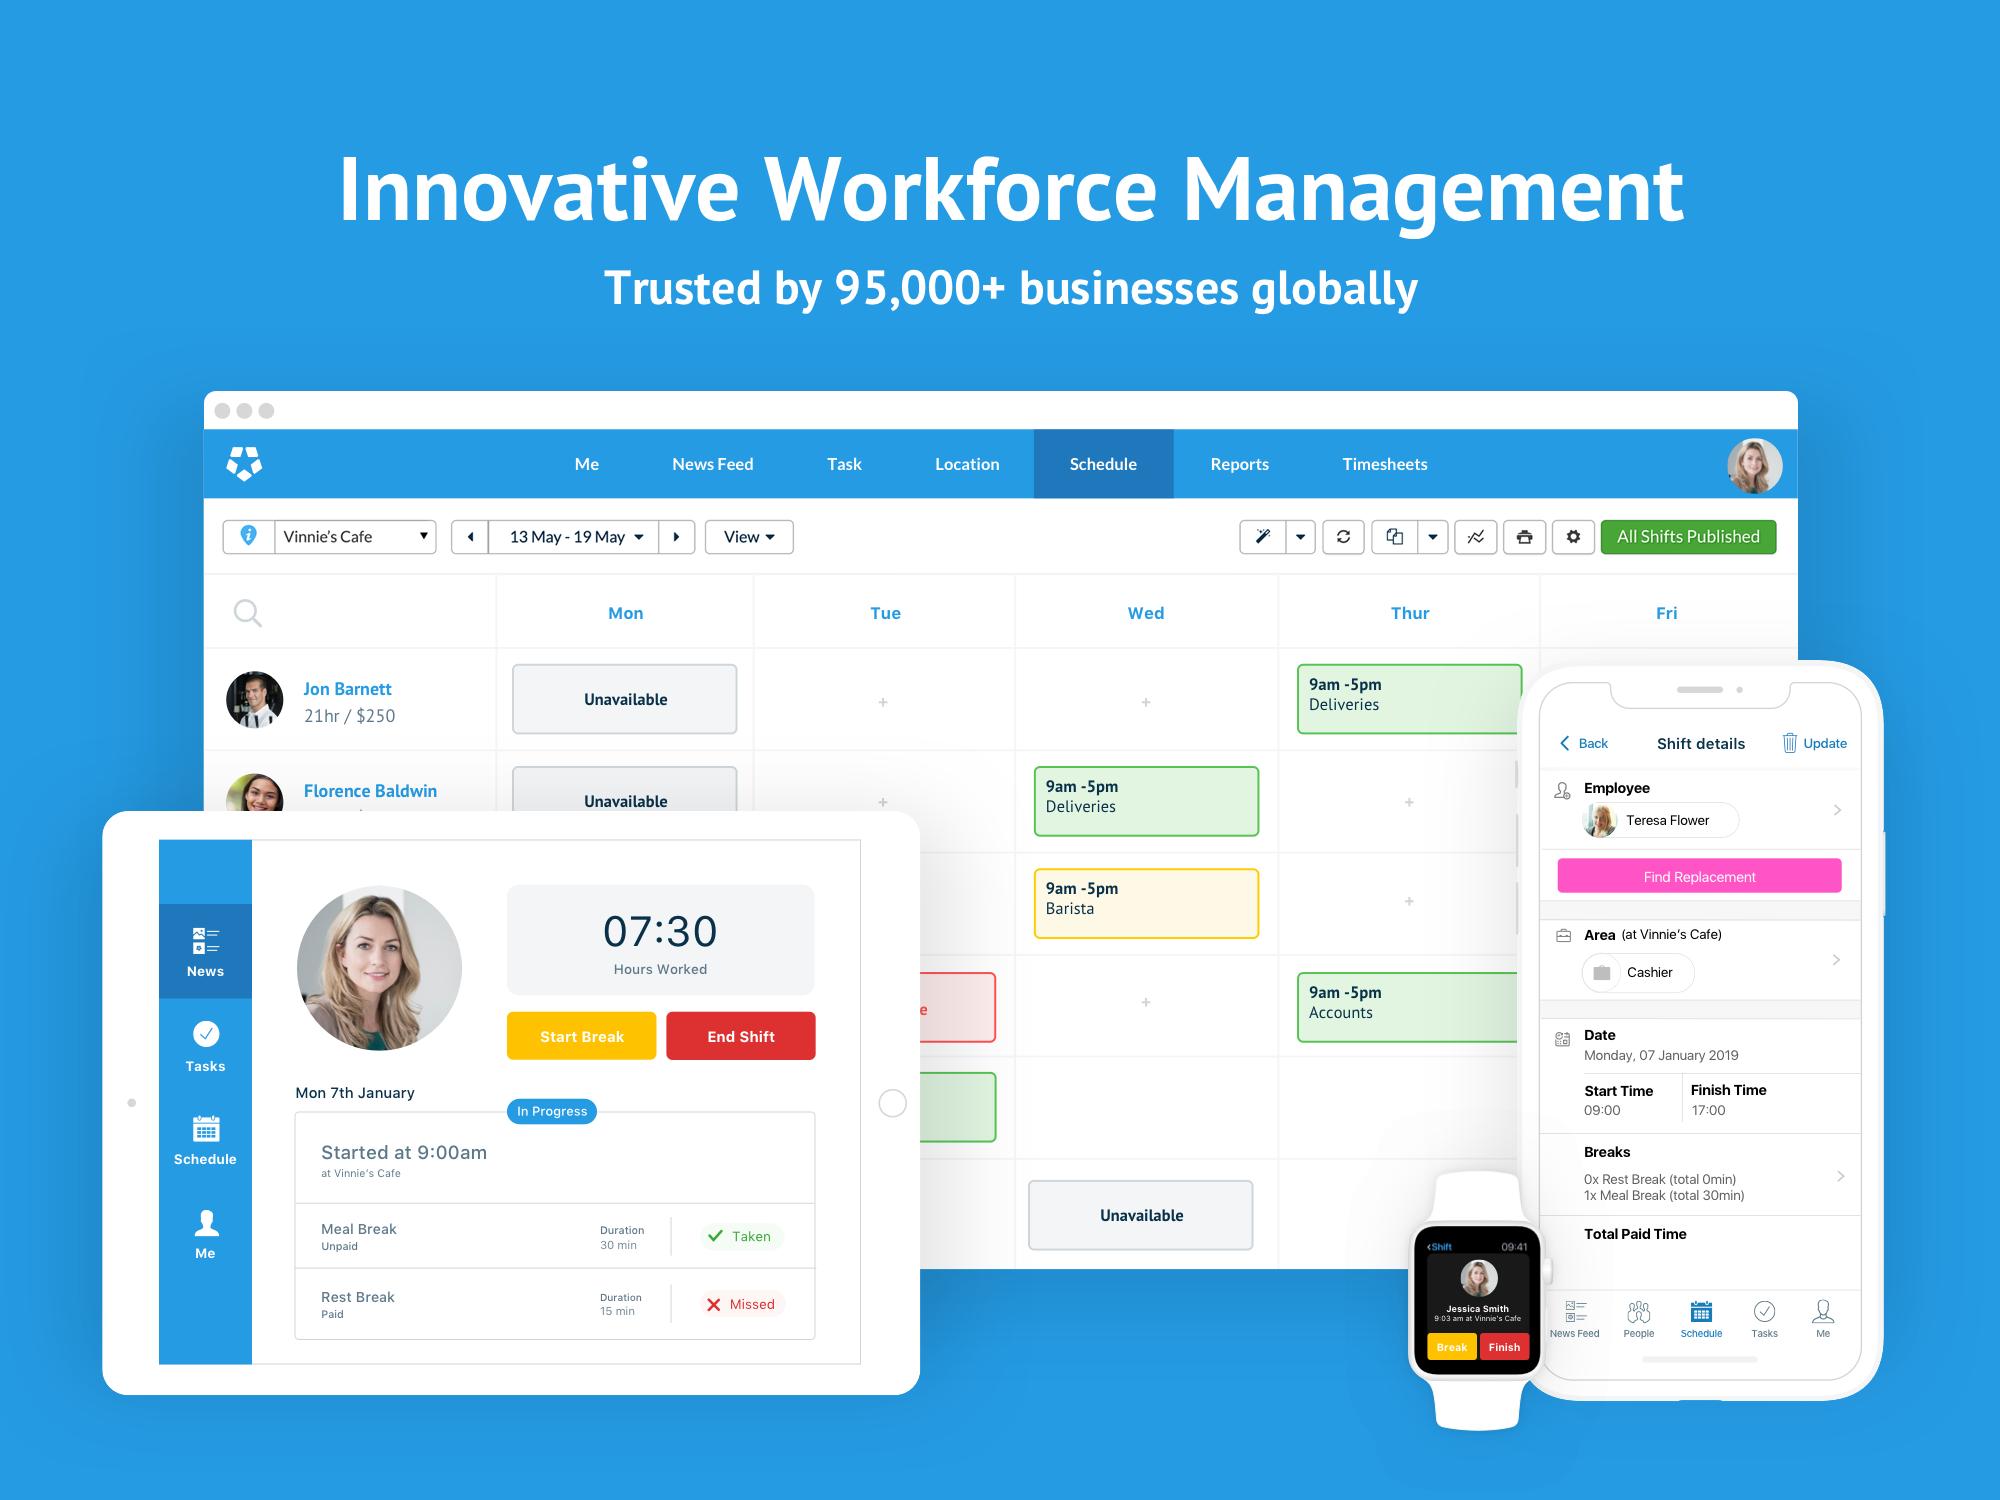 Deputy Software - Deputy workforce management